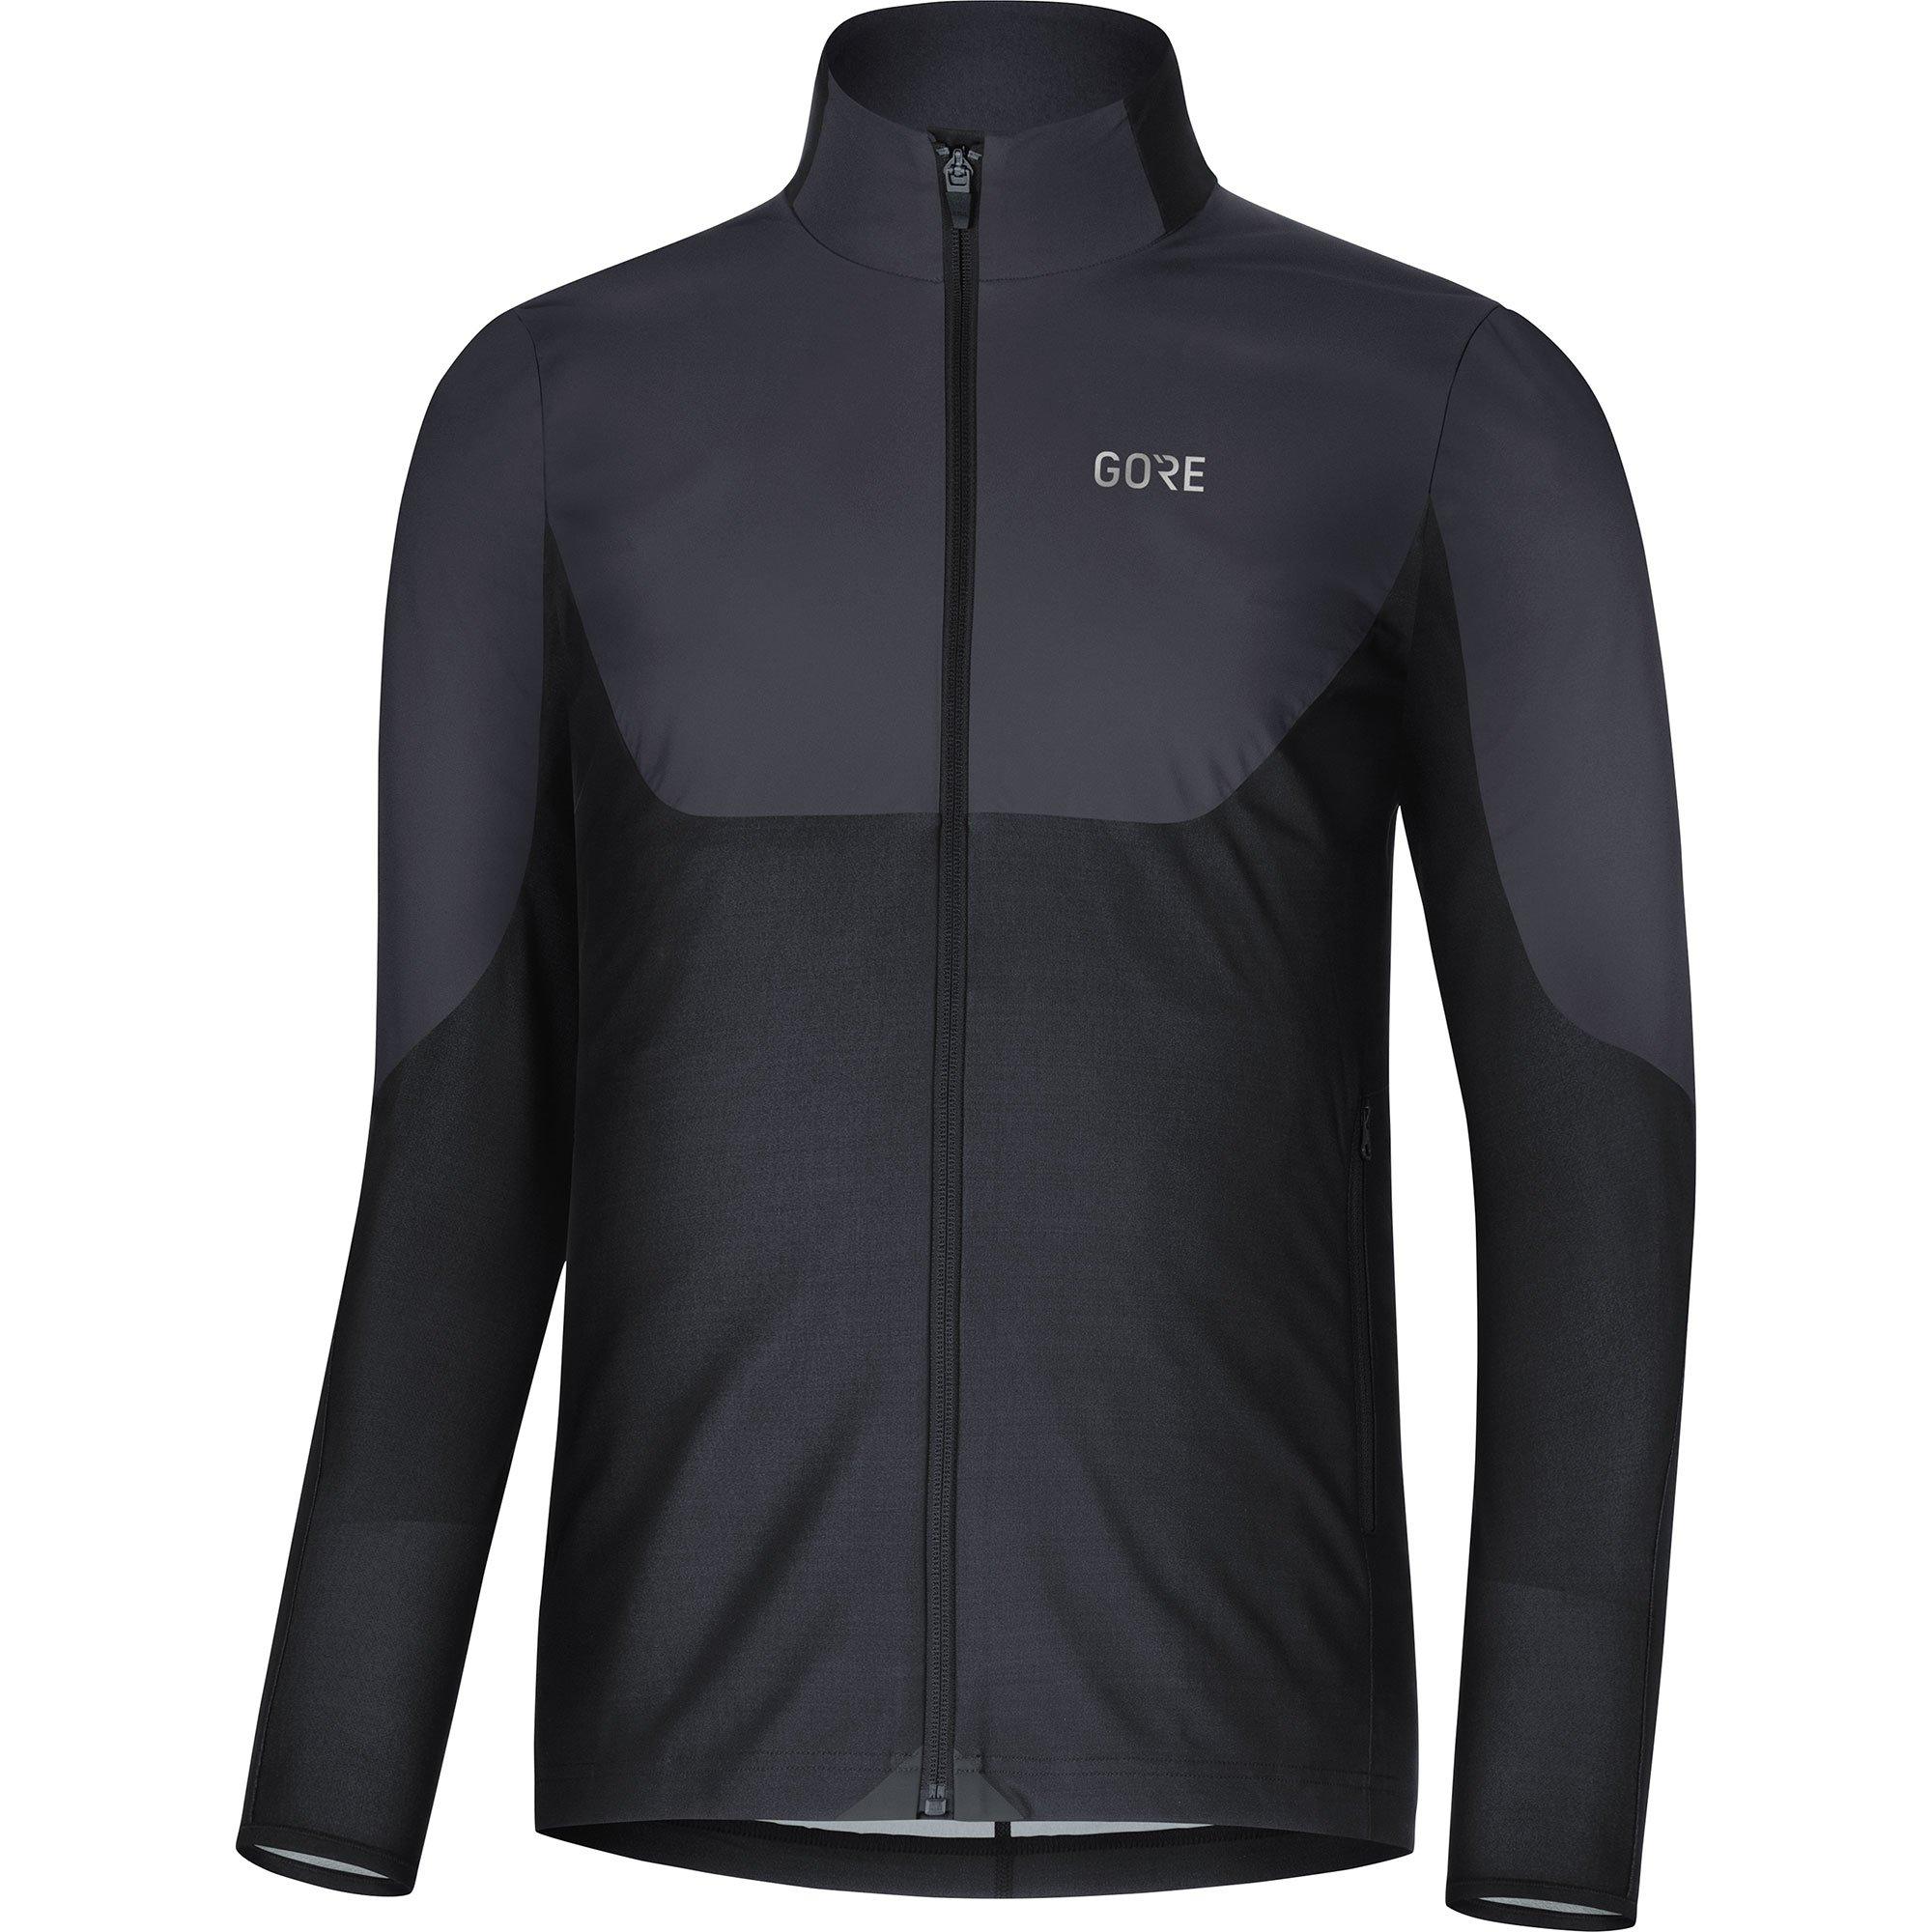 GORE WEAR Herren R5 Windstopper Shirt langarm, Terra Grey/Black, M-L